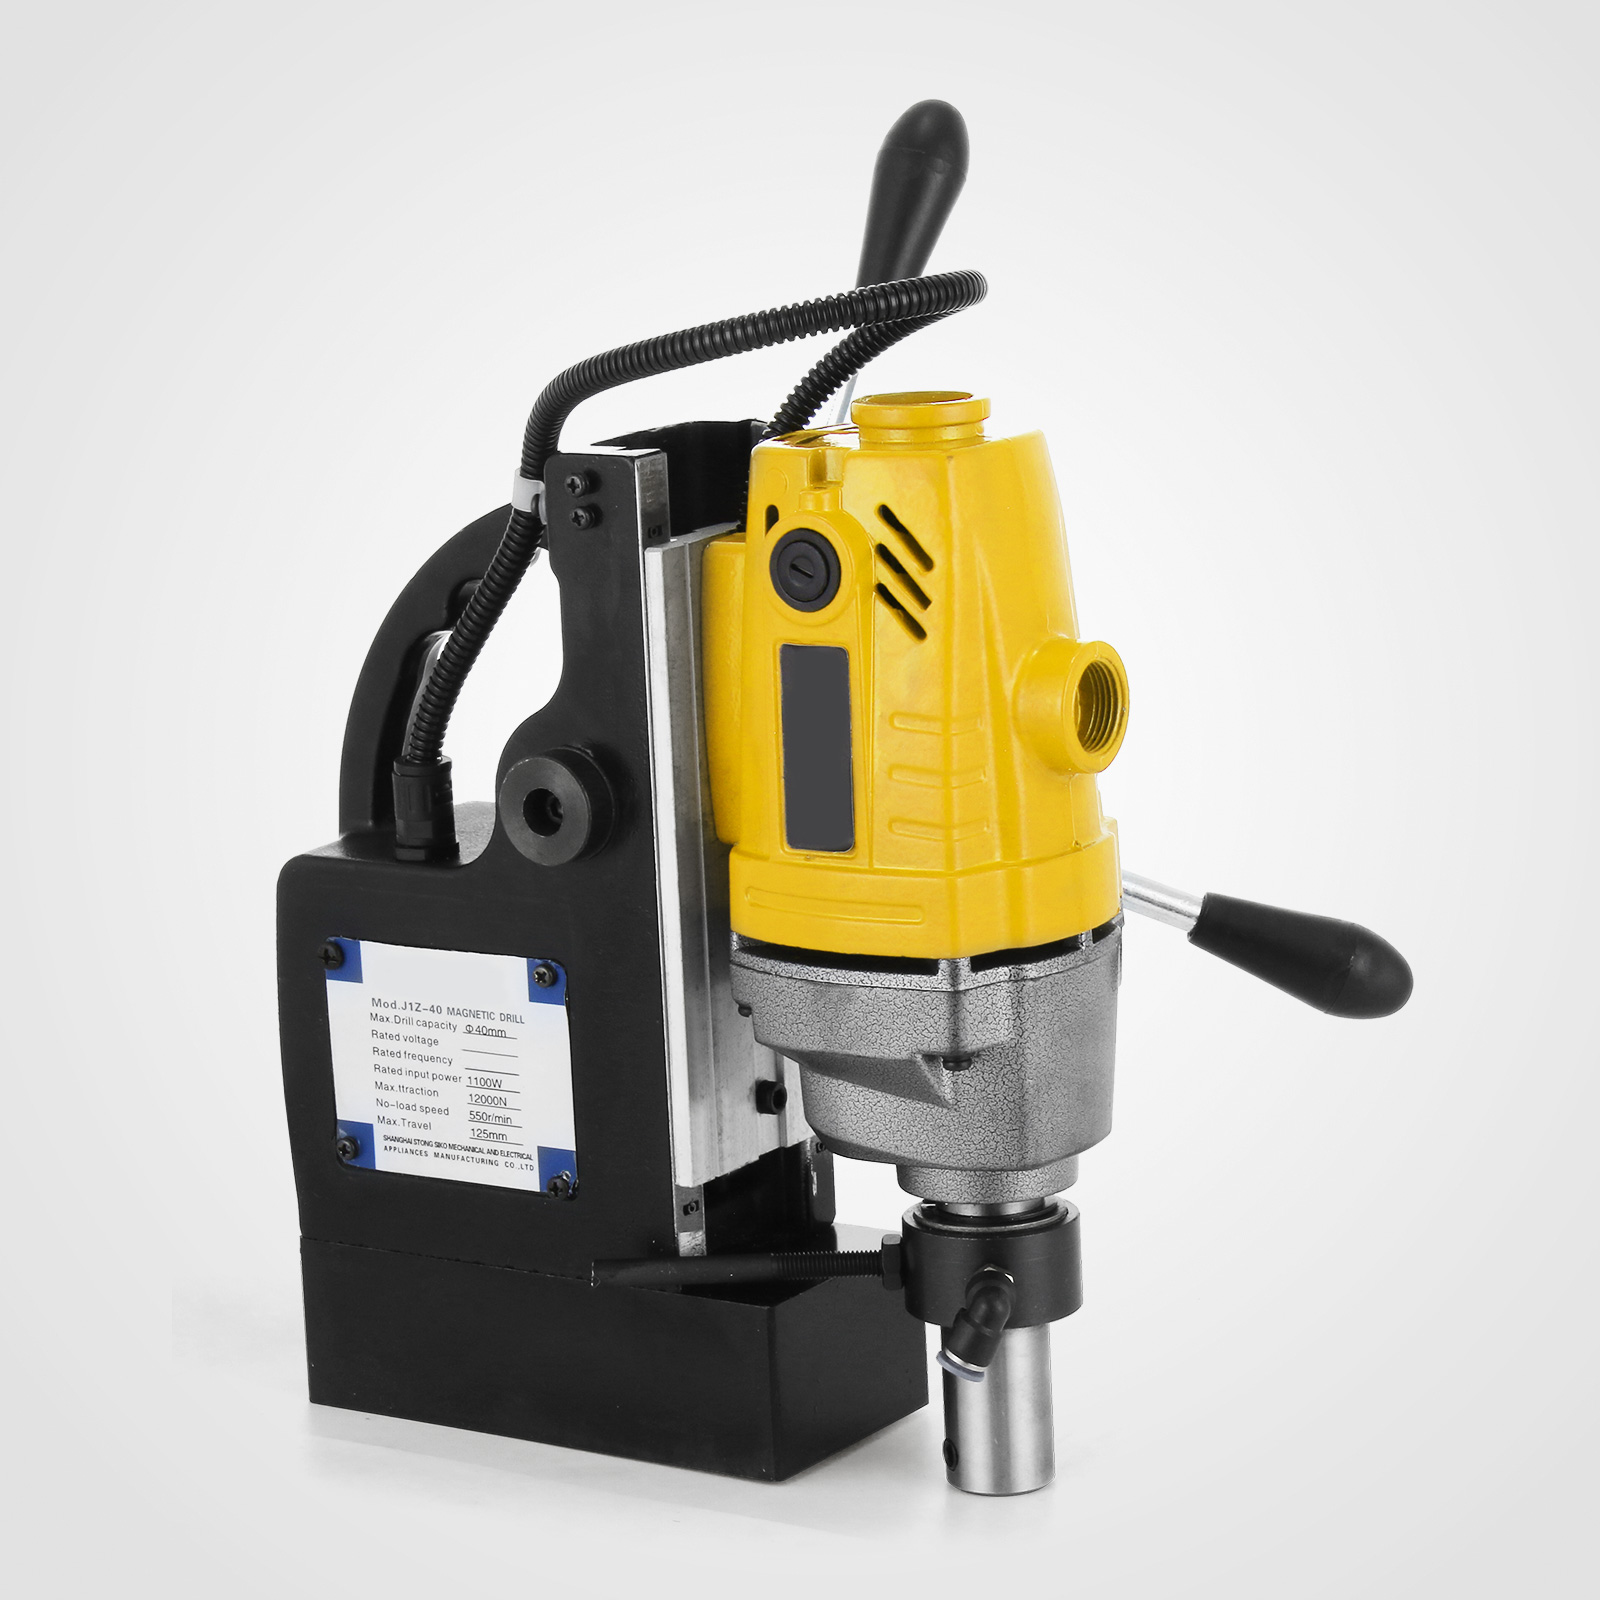 MB23-BRM35-MD40-Trapano-Perforatrice-Carotatore-Fresa-Magnetico-12-40mm-230V miniatura 17